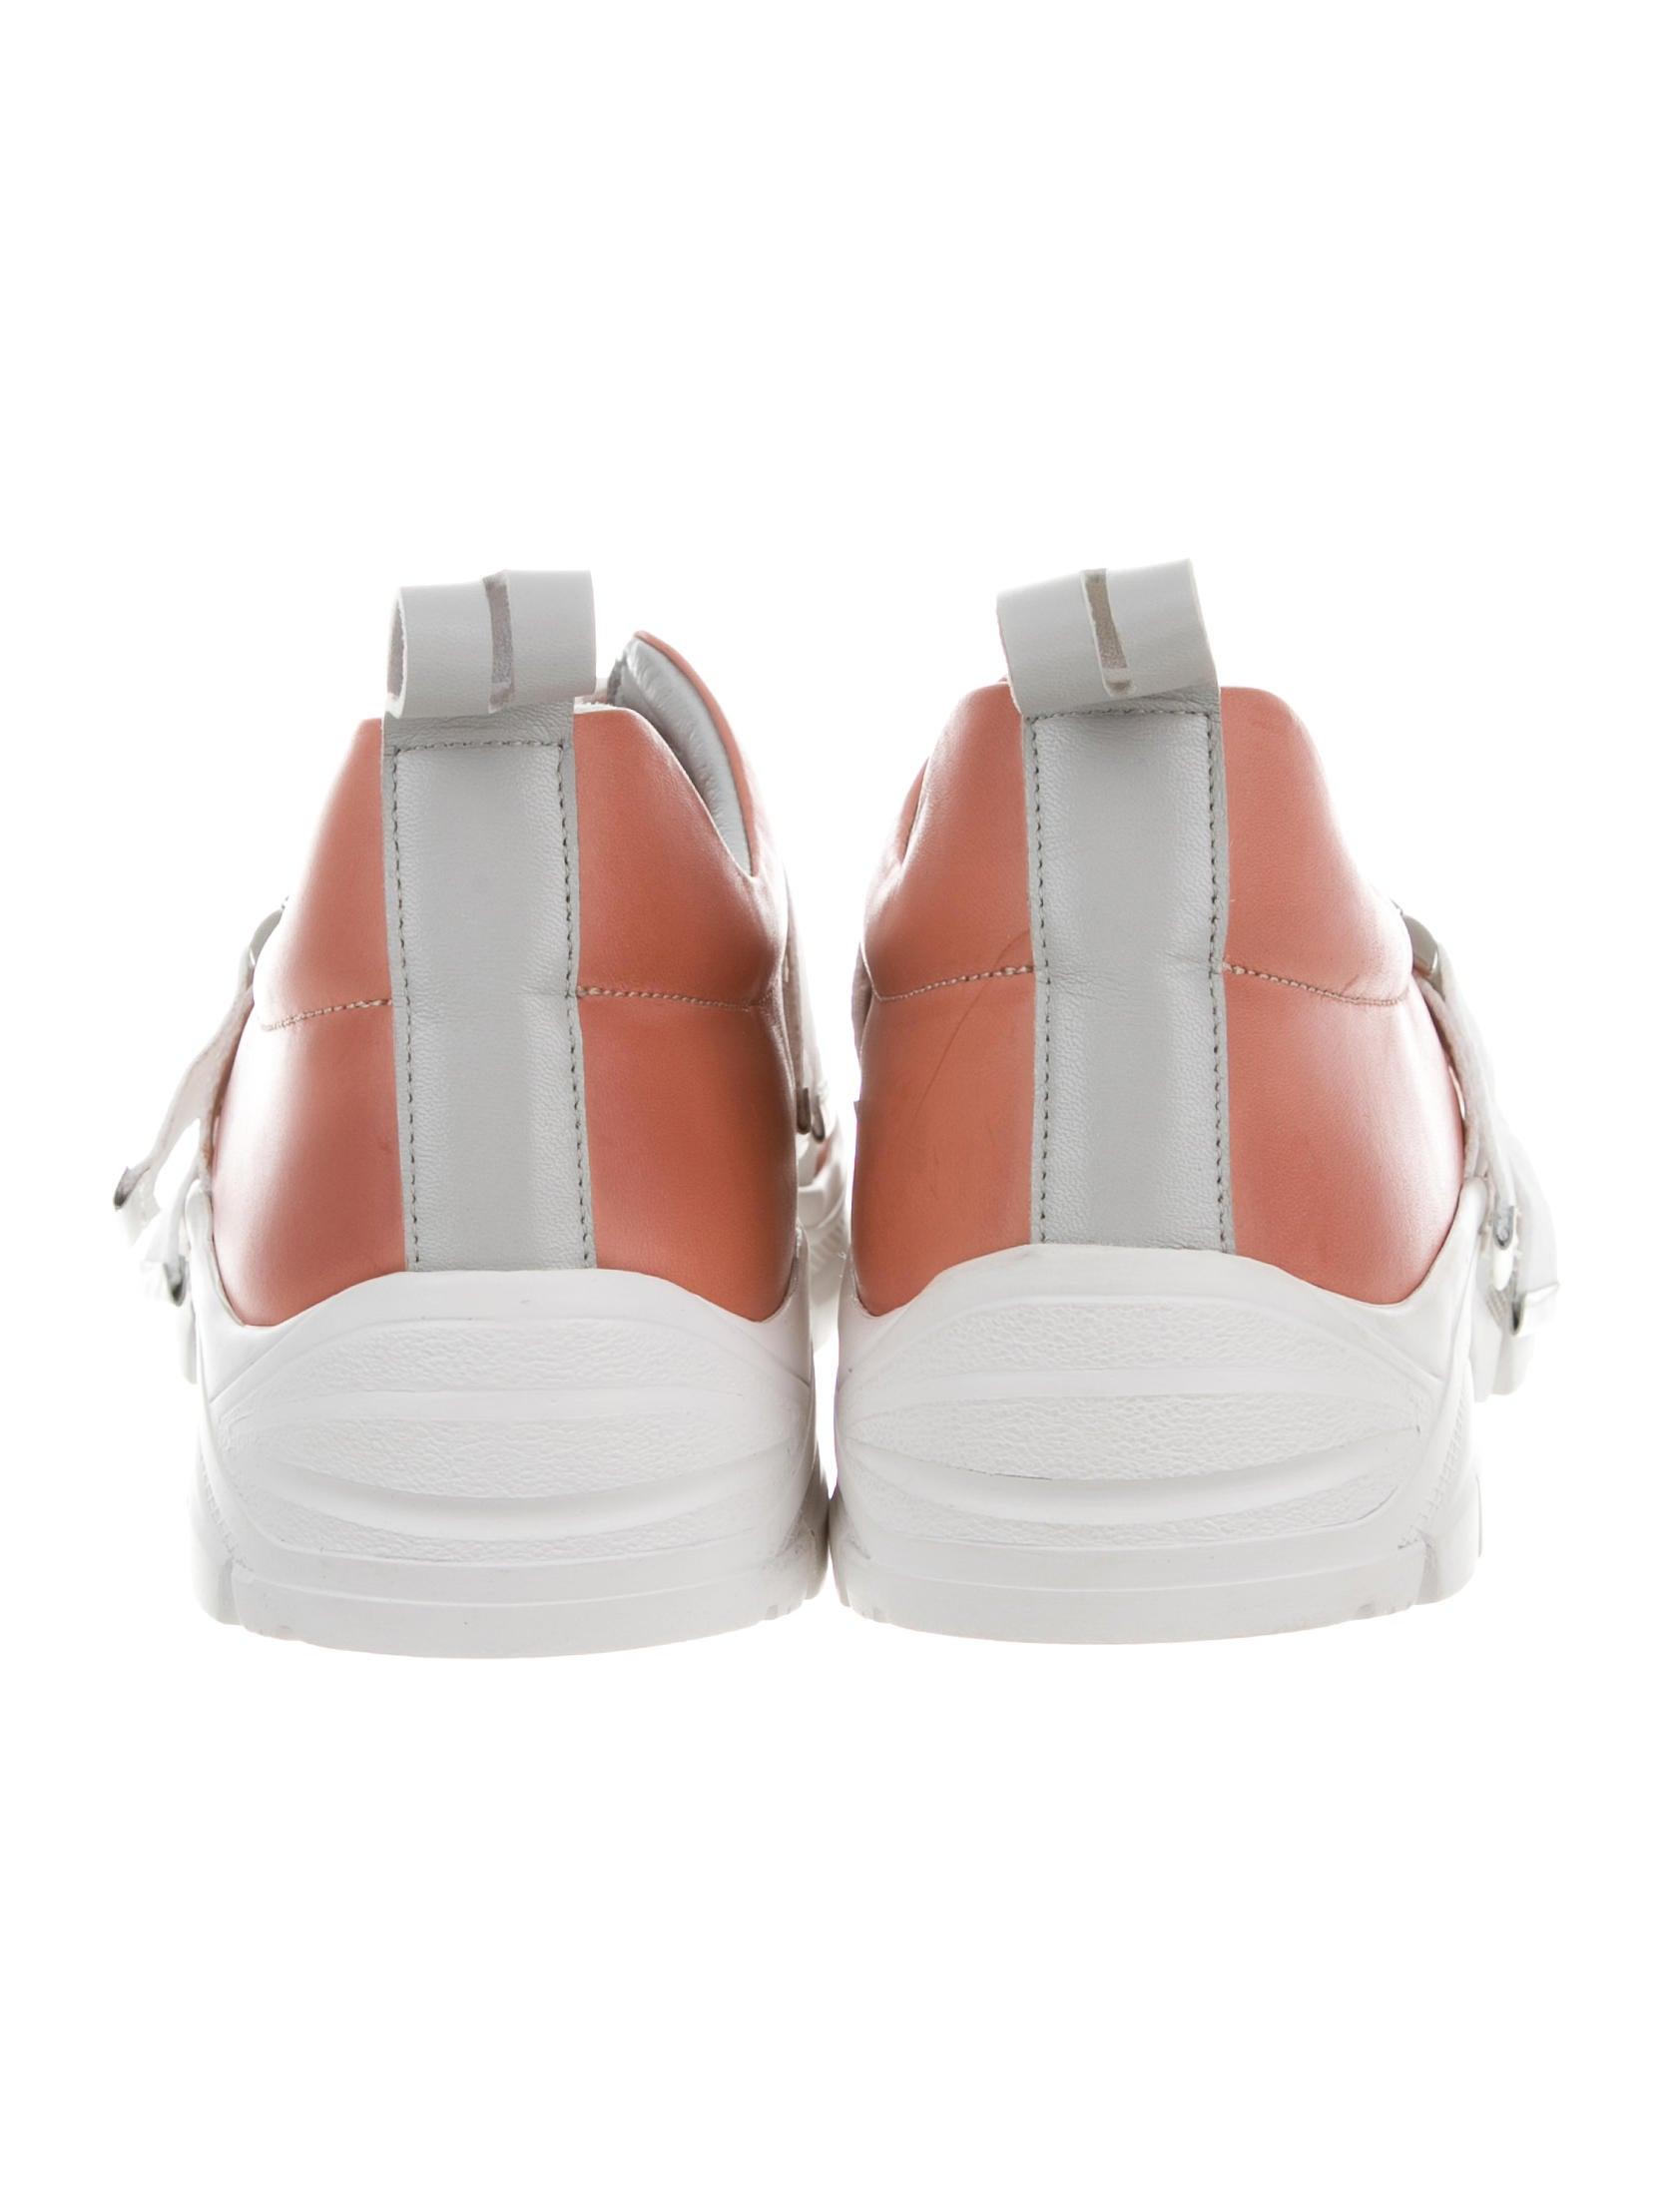 Arpent Nursa Leather Sneakers cheap sale fake sast sale online wholesale price cheap online hqaxh